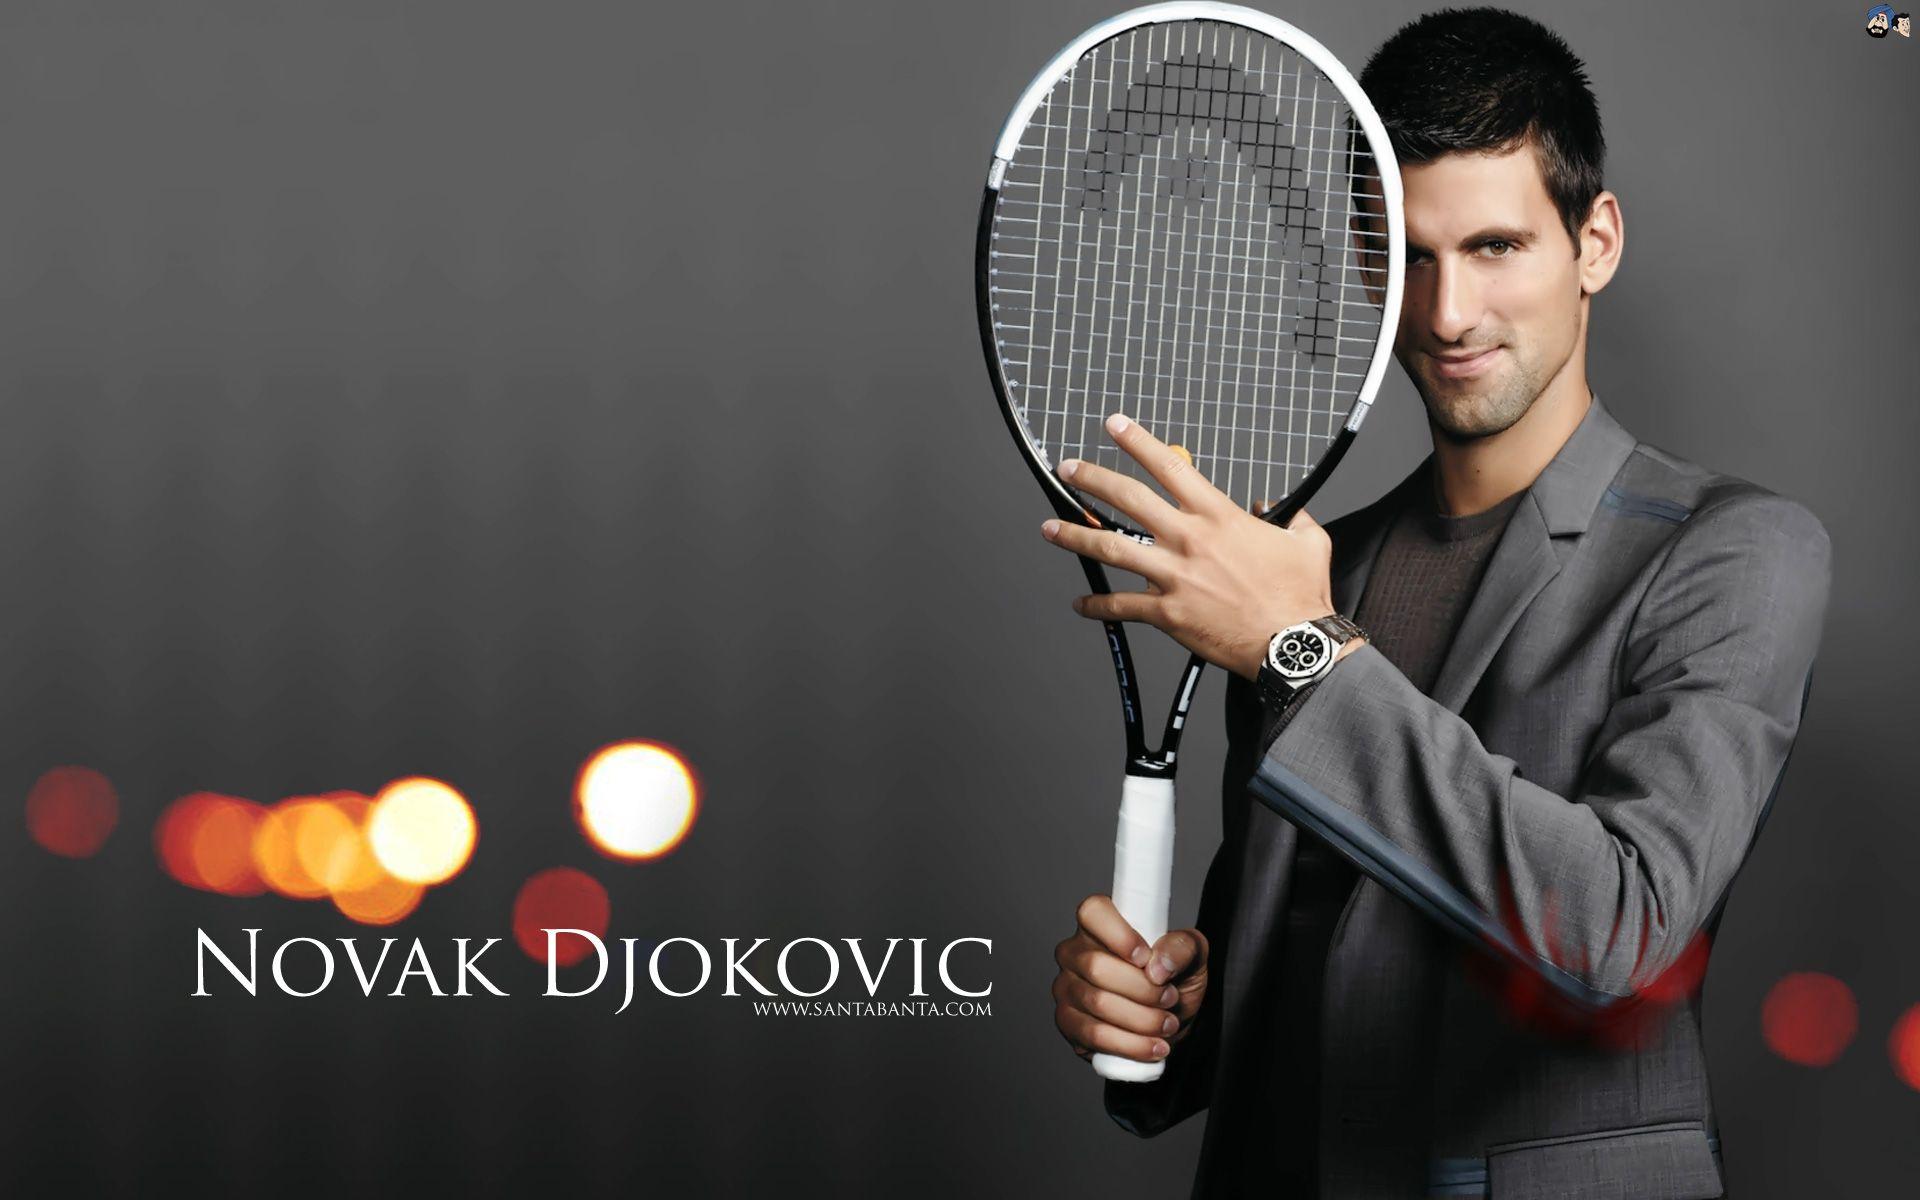 Novak Djokovic Wallpaper 17 Novak Djokovic Tennis Wallpaper Tennis